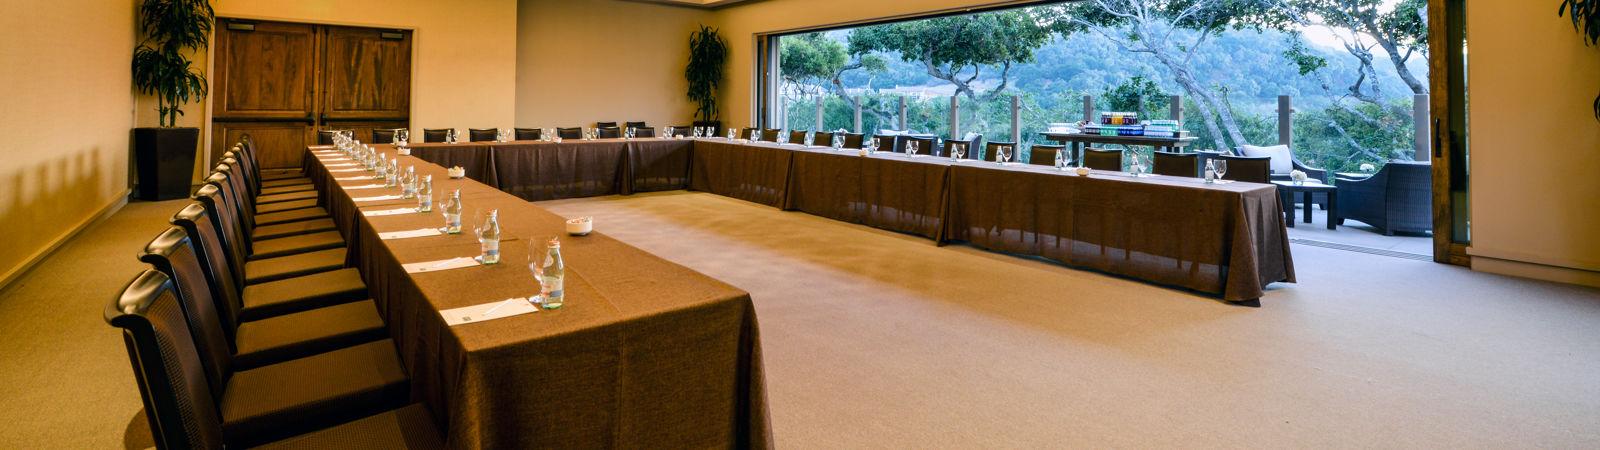 Carmel Valley Ranch_Meetings_Vintner Room U-shape open face